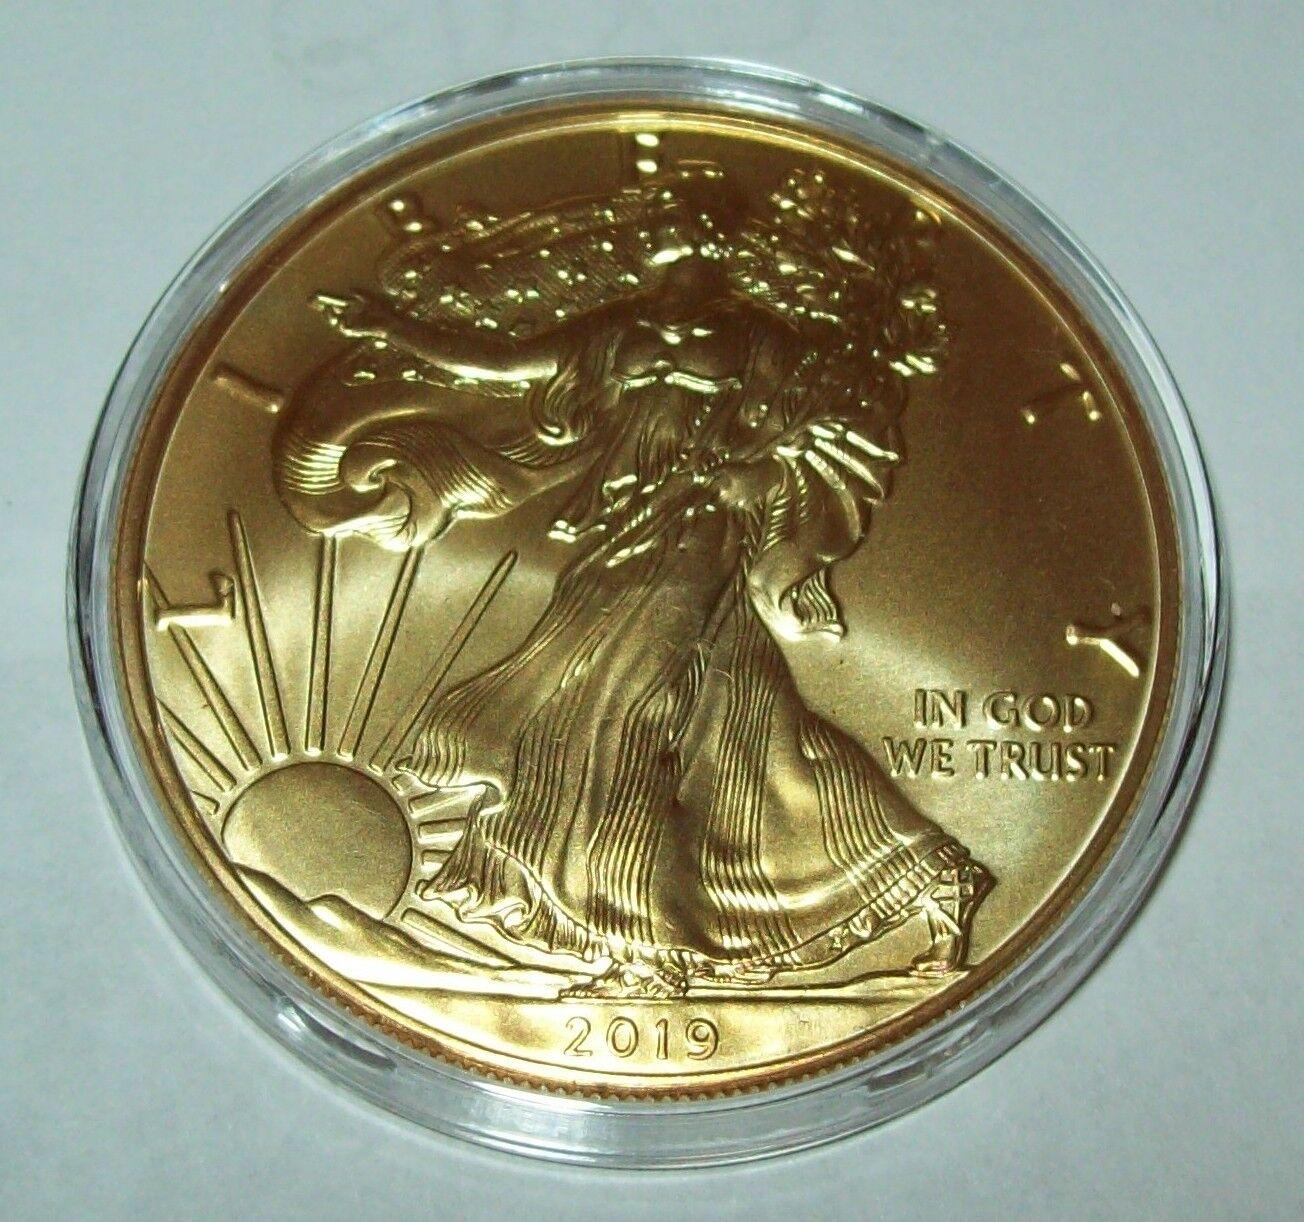 2019 Gold Gilded American Silver Eagle 1 Troy Oz. .999 Fine One Dollar Coin  - $78.00